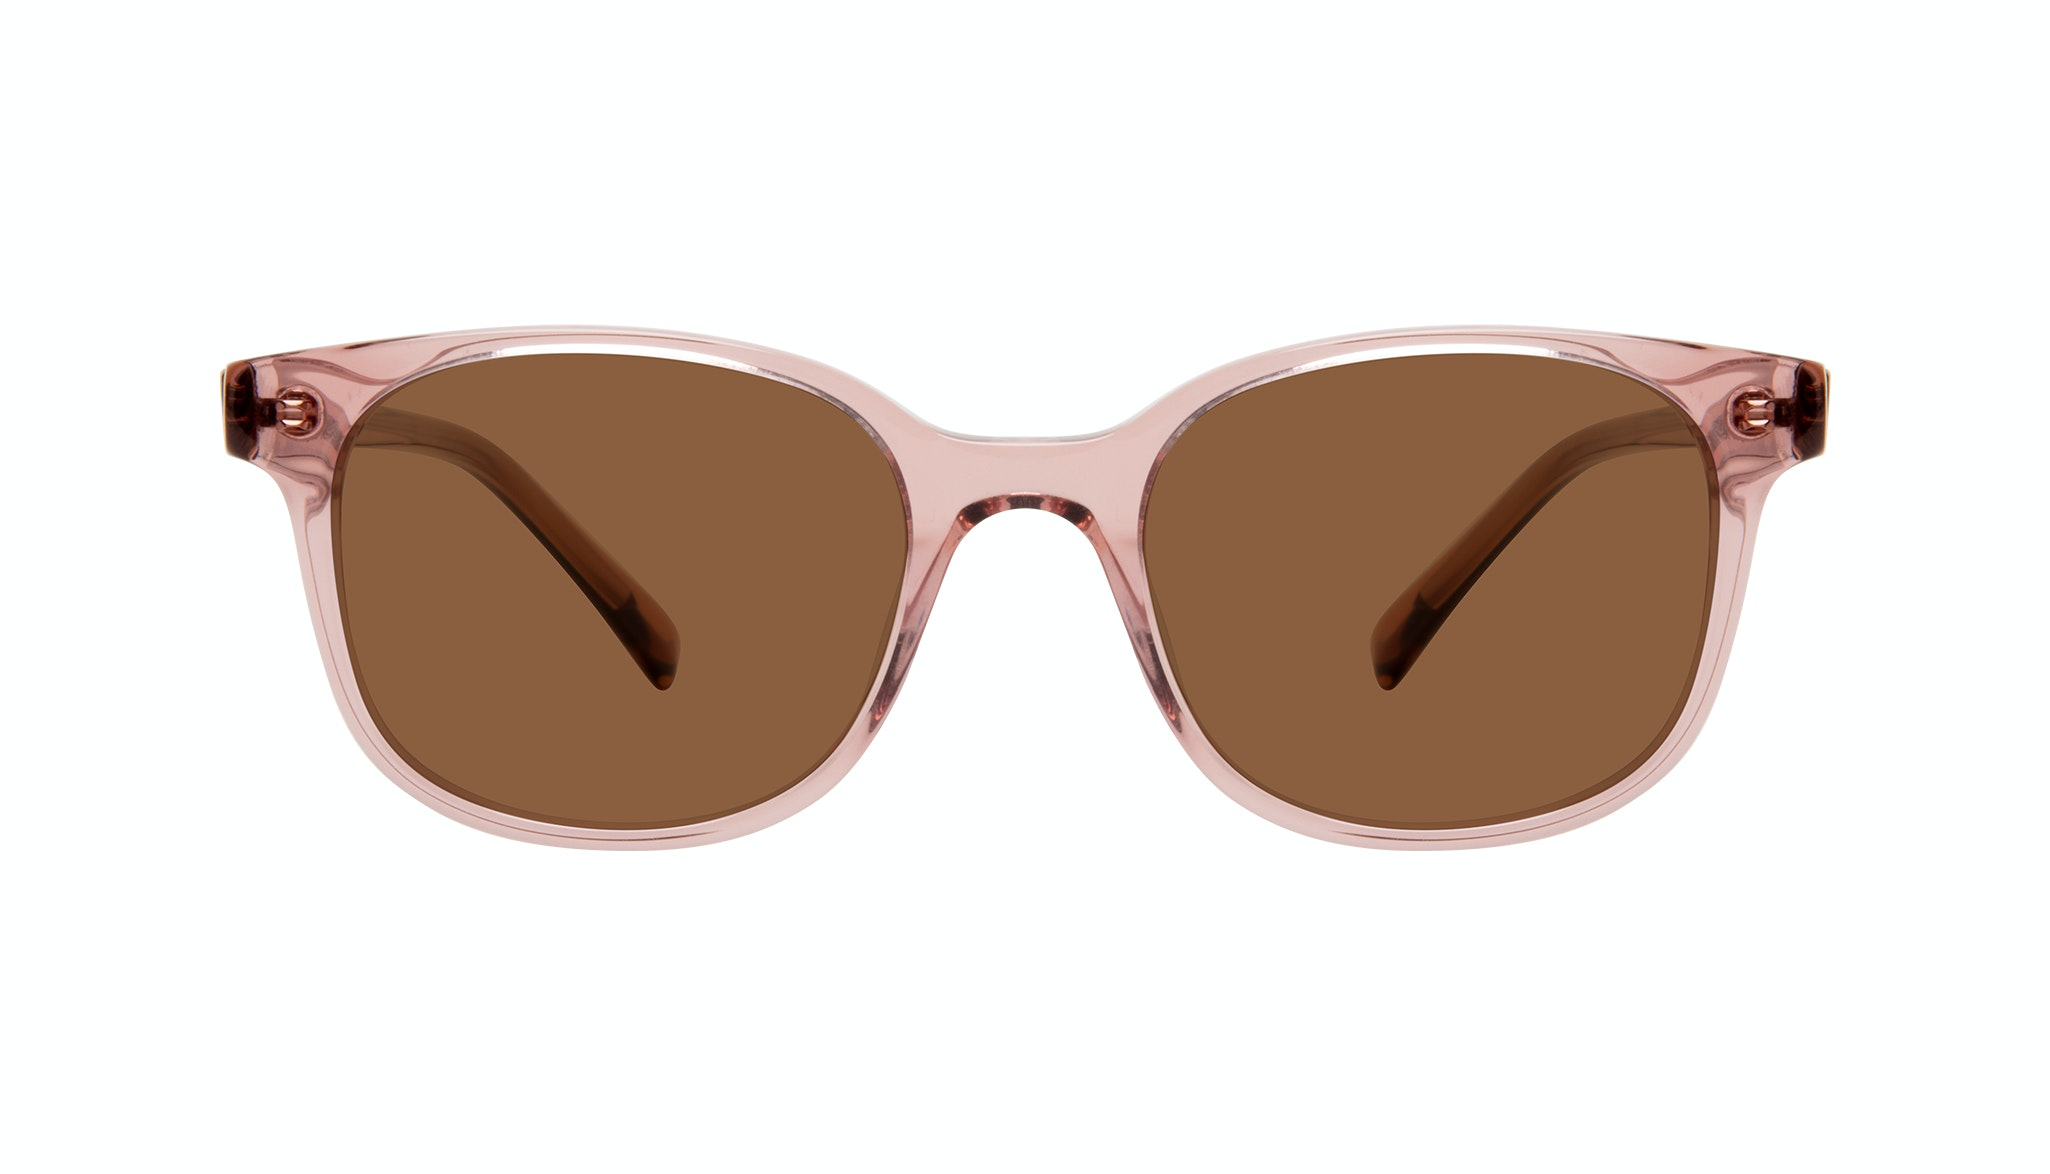 Affordable Fashion Glasses Square Sunglasses Women Unique Rose Front